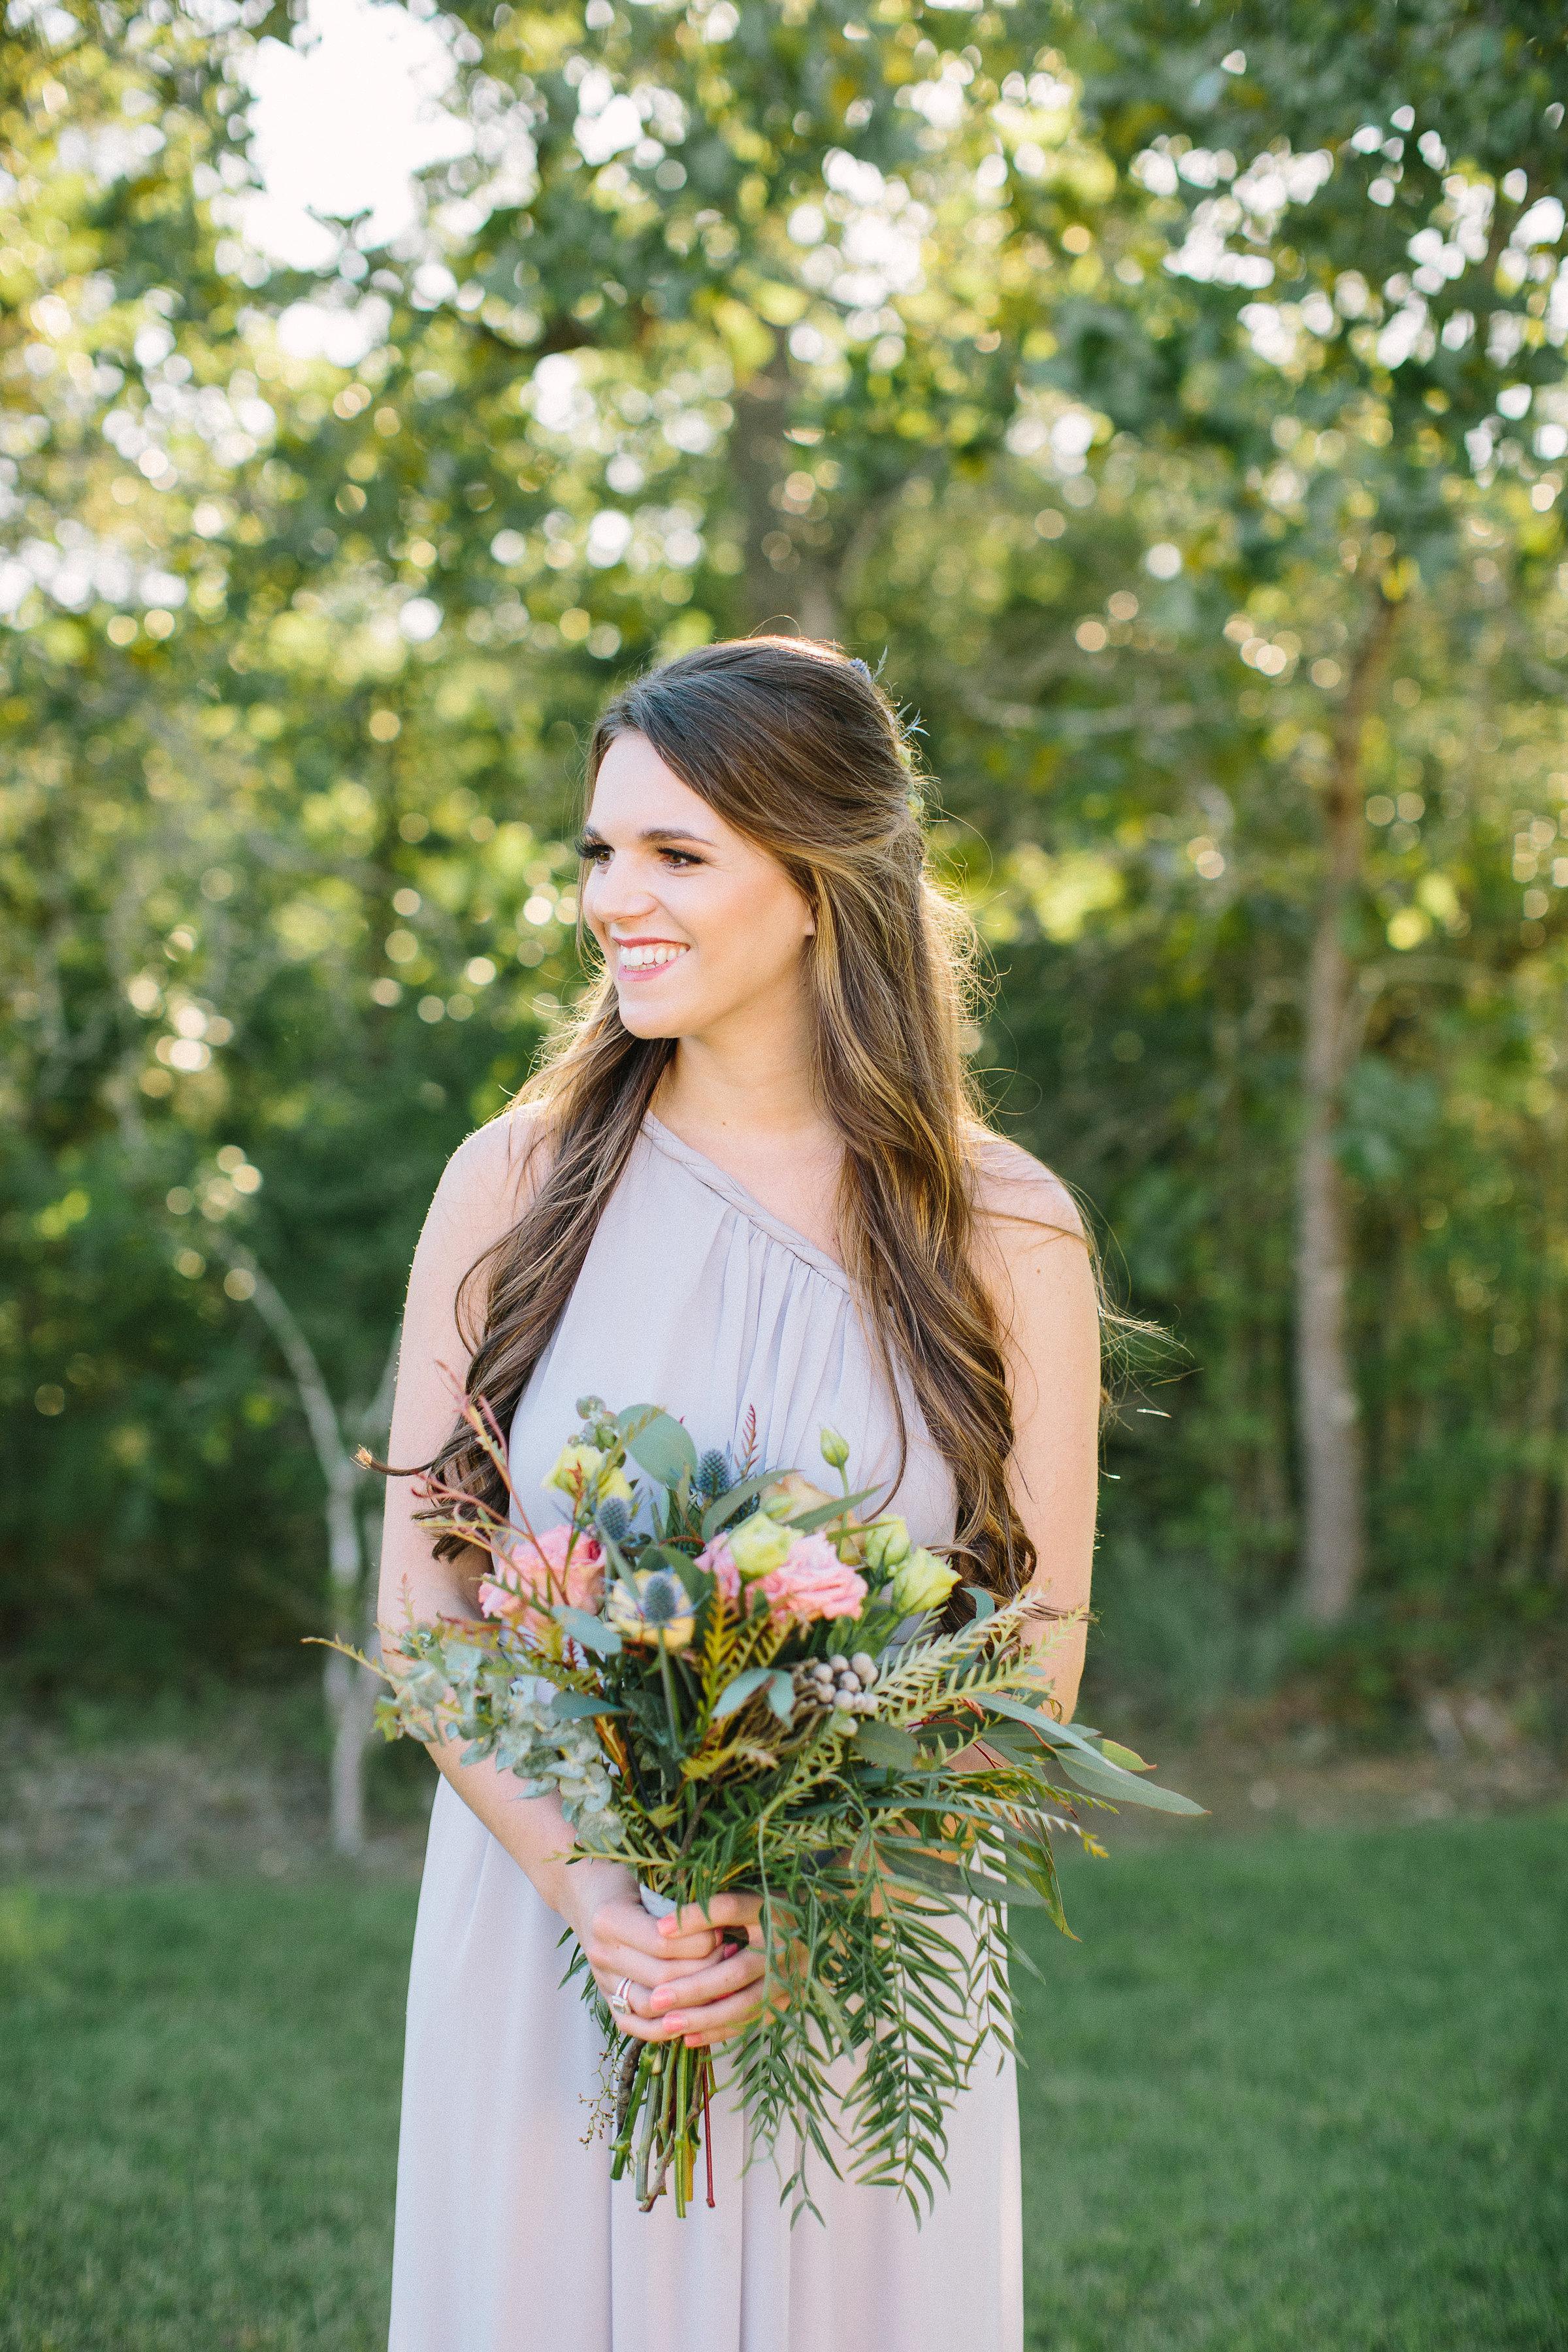 Ellen-Ashton-Photography-Peach-Creek-Ranch-Weddings-Wed-and-Prosper179